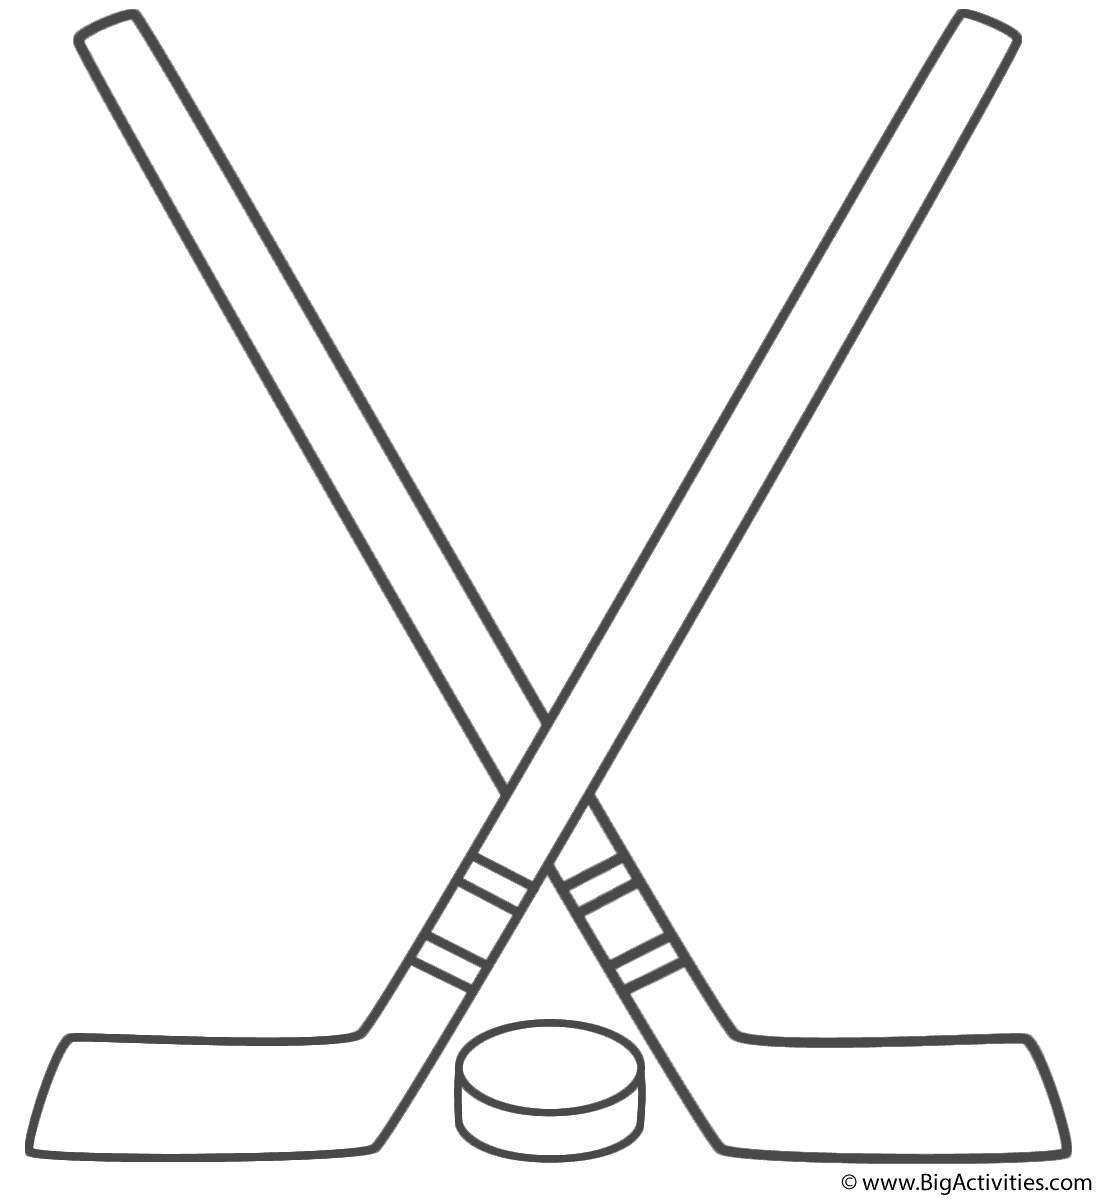 Hockey Sticks With Puck